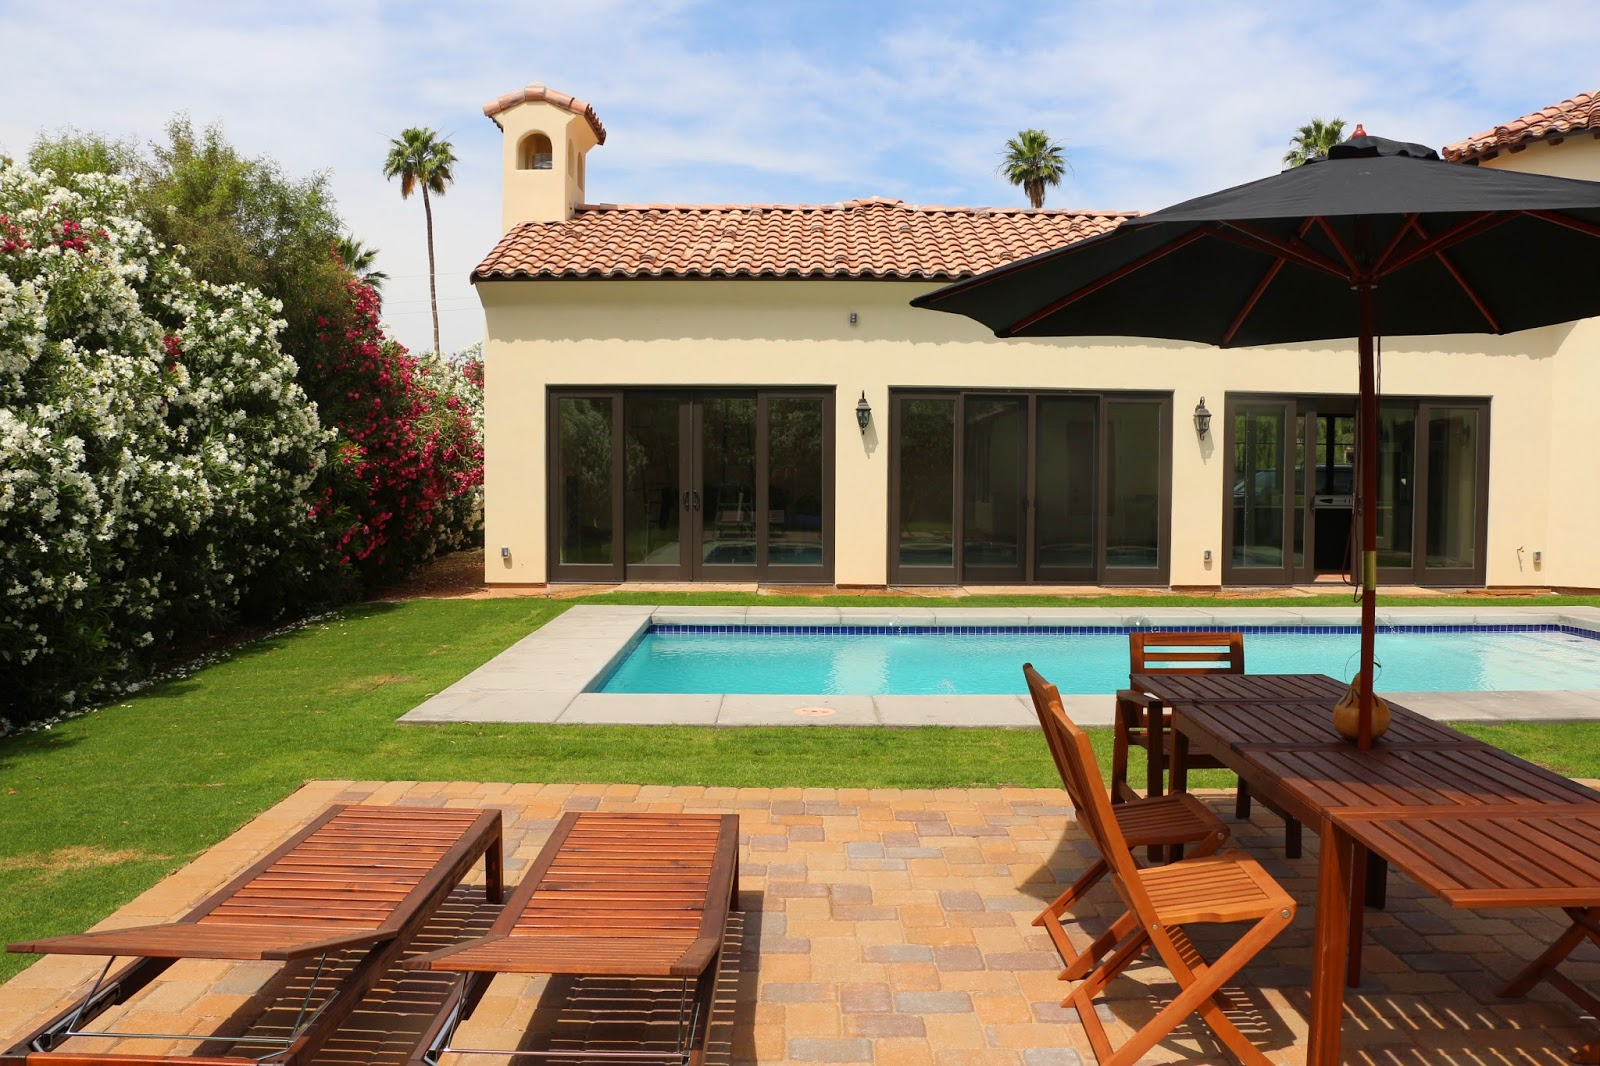 spanish colonial house and pool, ikea patio furniture, ikea chaise lounge,